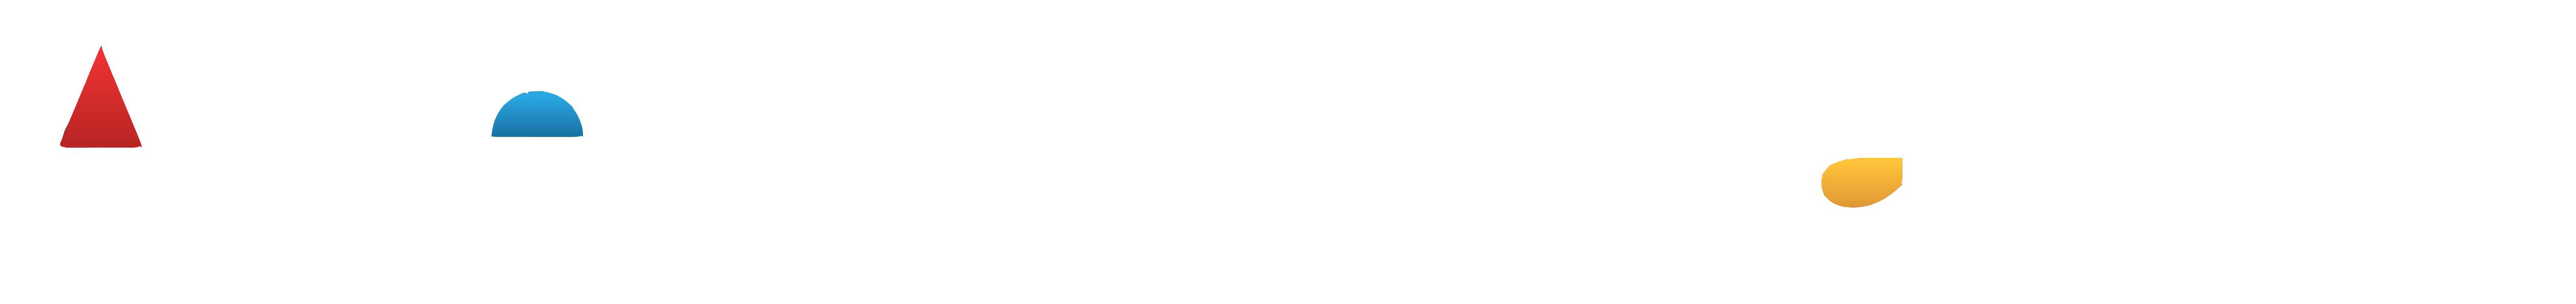 ArteGlobe